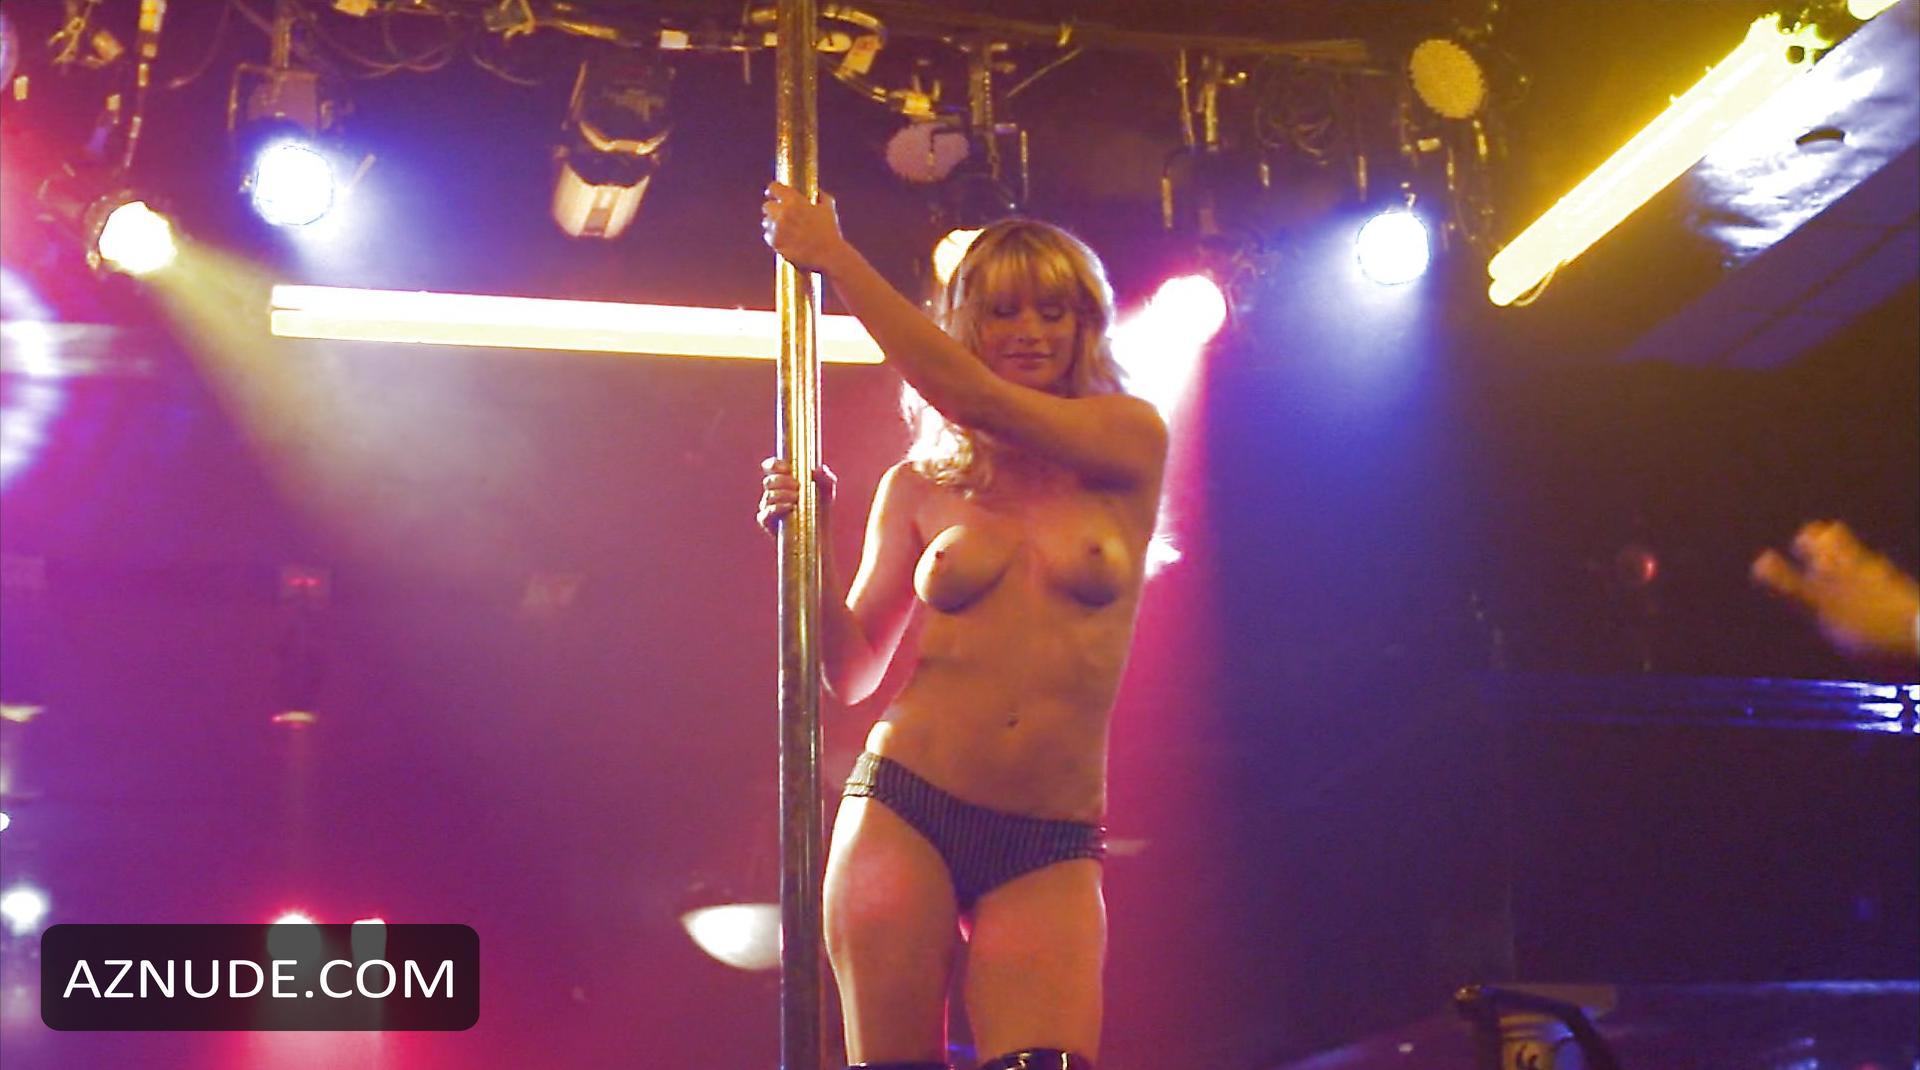 Kim yates lap dance clip 2 - 3 9